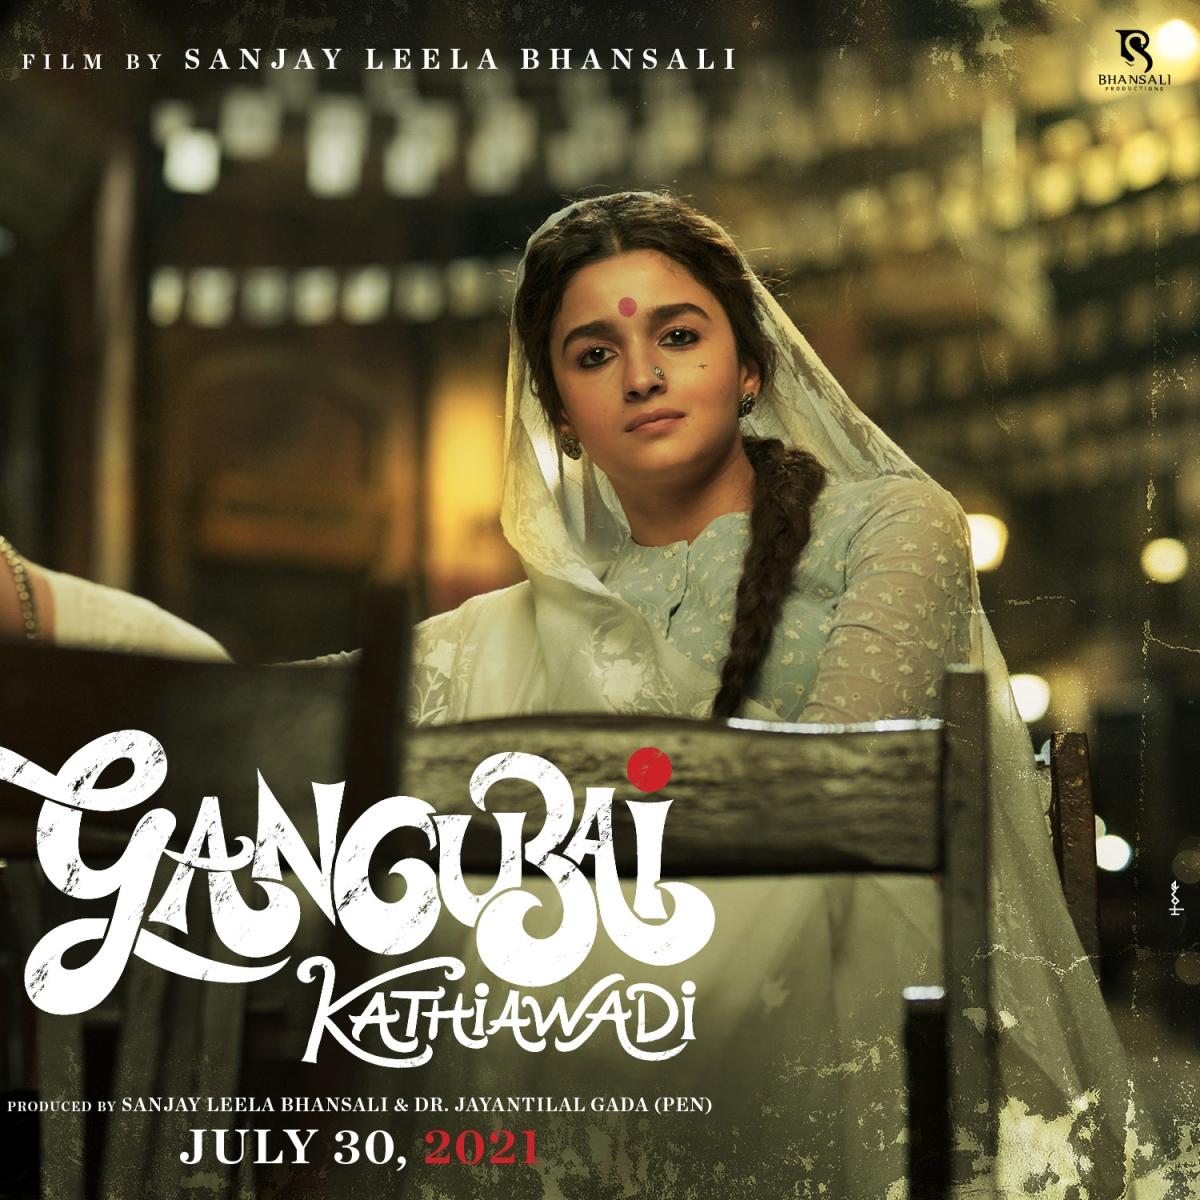 On Sanjay Leela Bhansali's 57th birthday, makers announce release date of Alia Bhatt's 'Gangubai Kathiawadi'